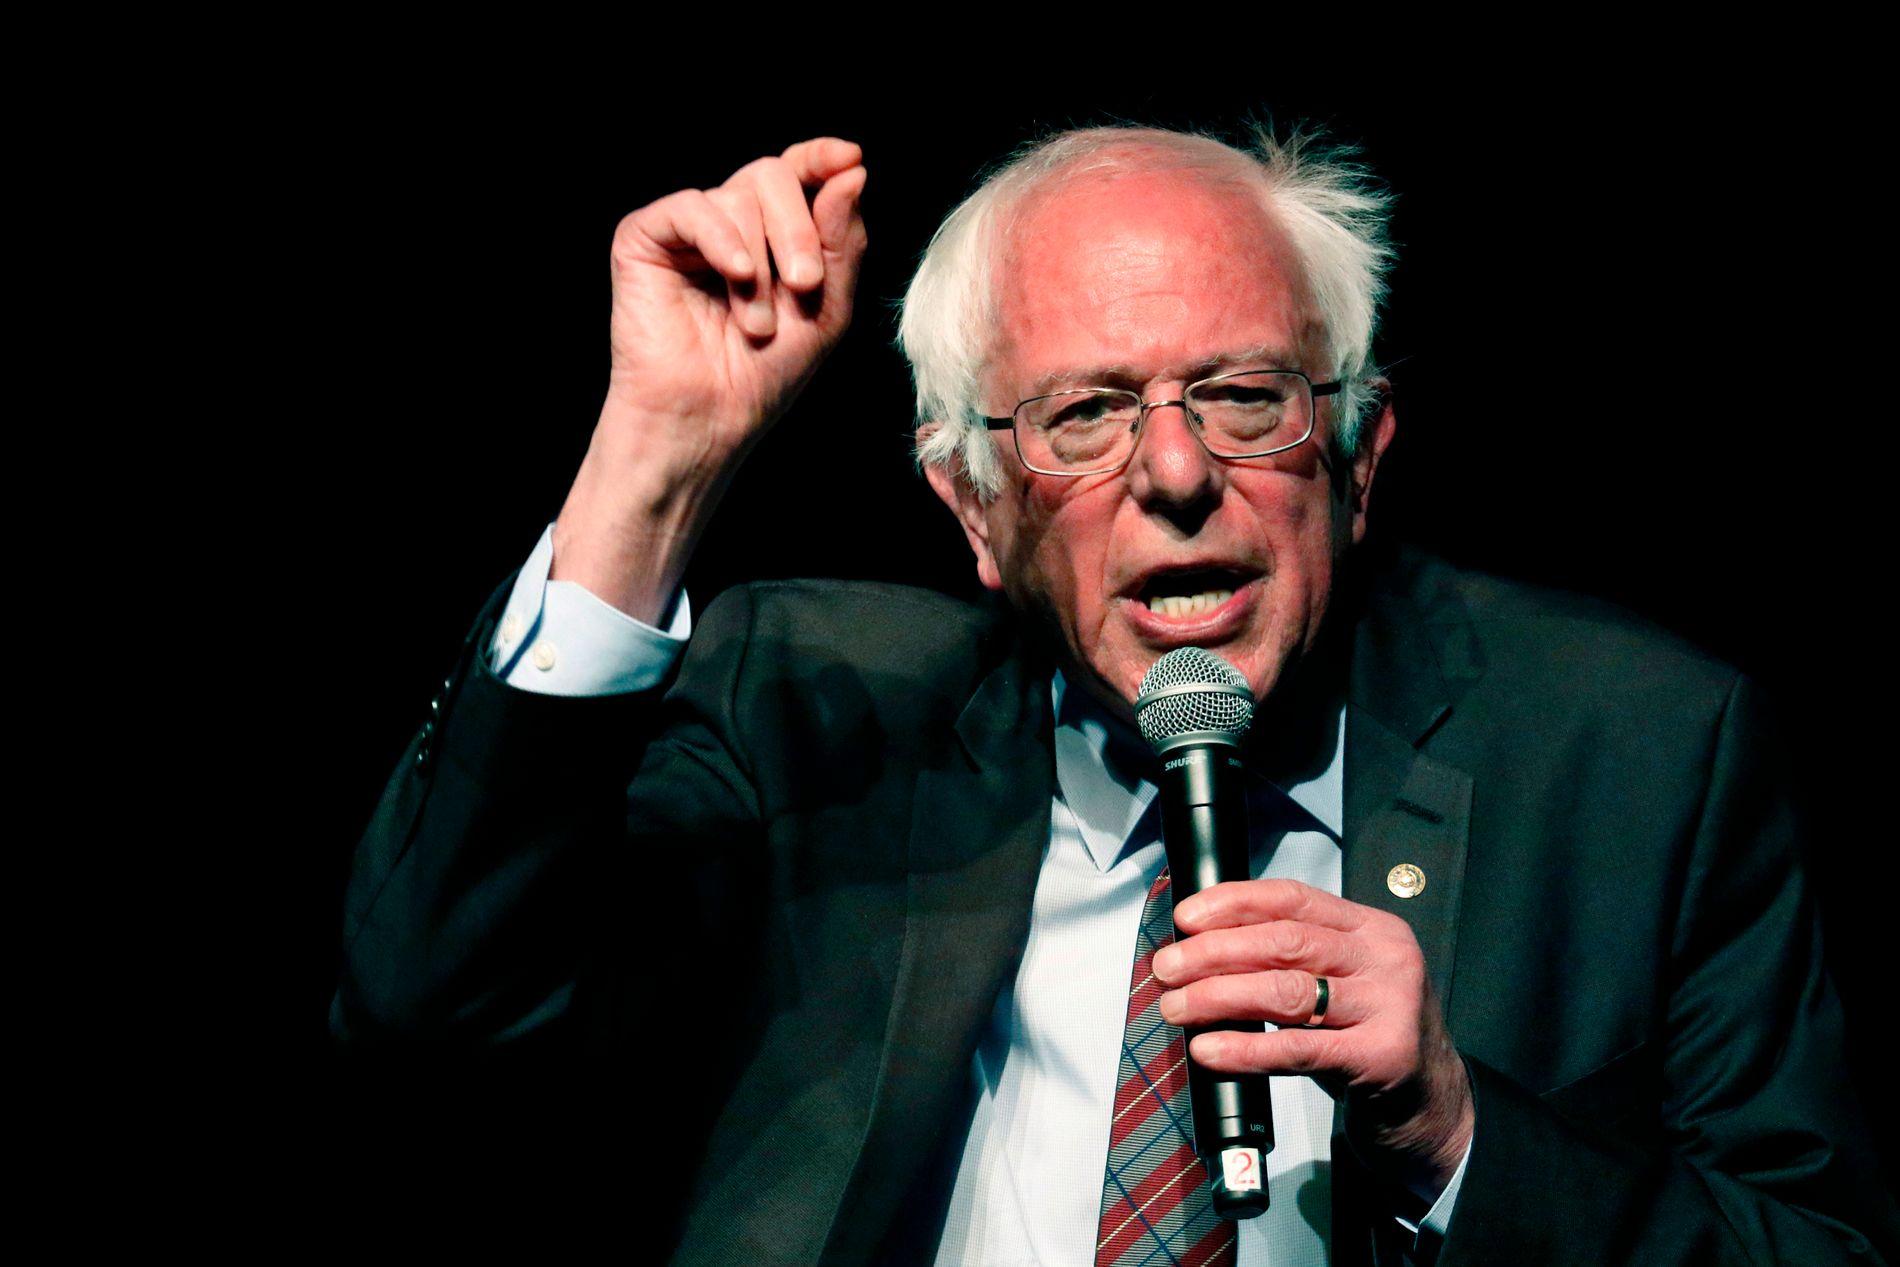 NY SJANSE?: Bernie Sanders' kampanje i 2016 vekket en venstredreining i Det demokratiske partiet.